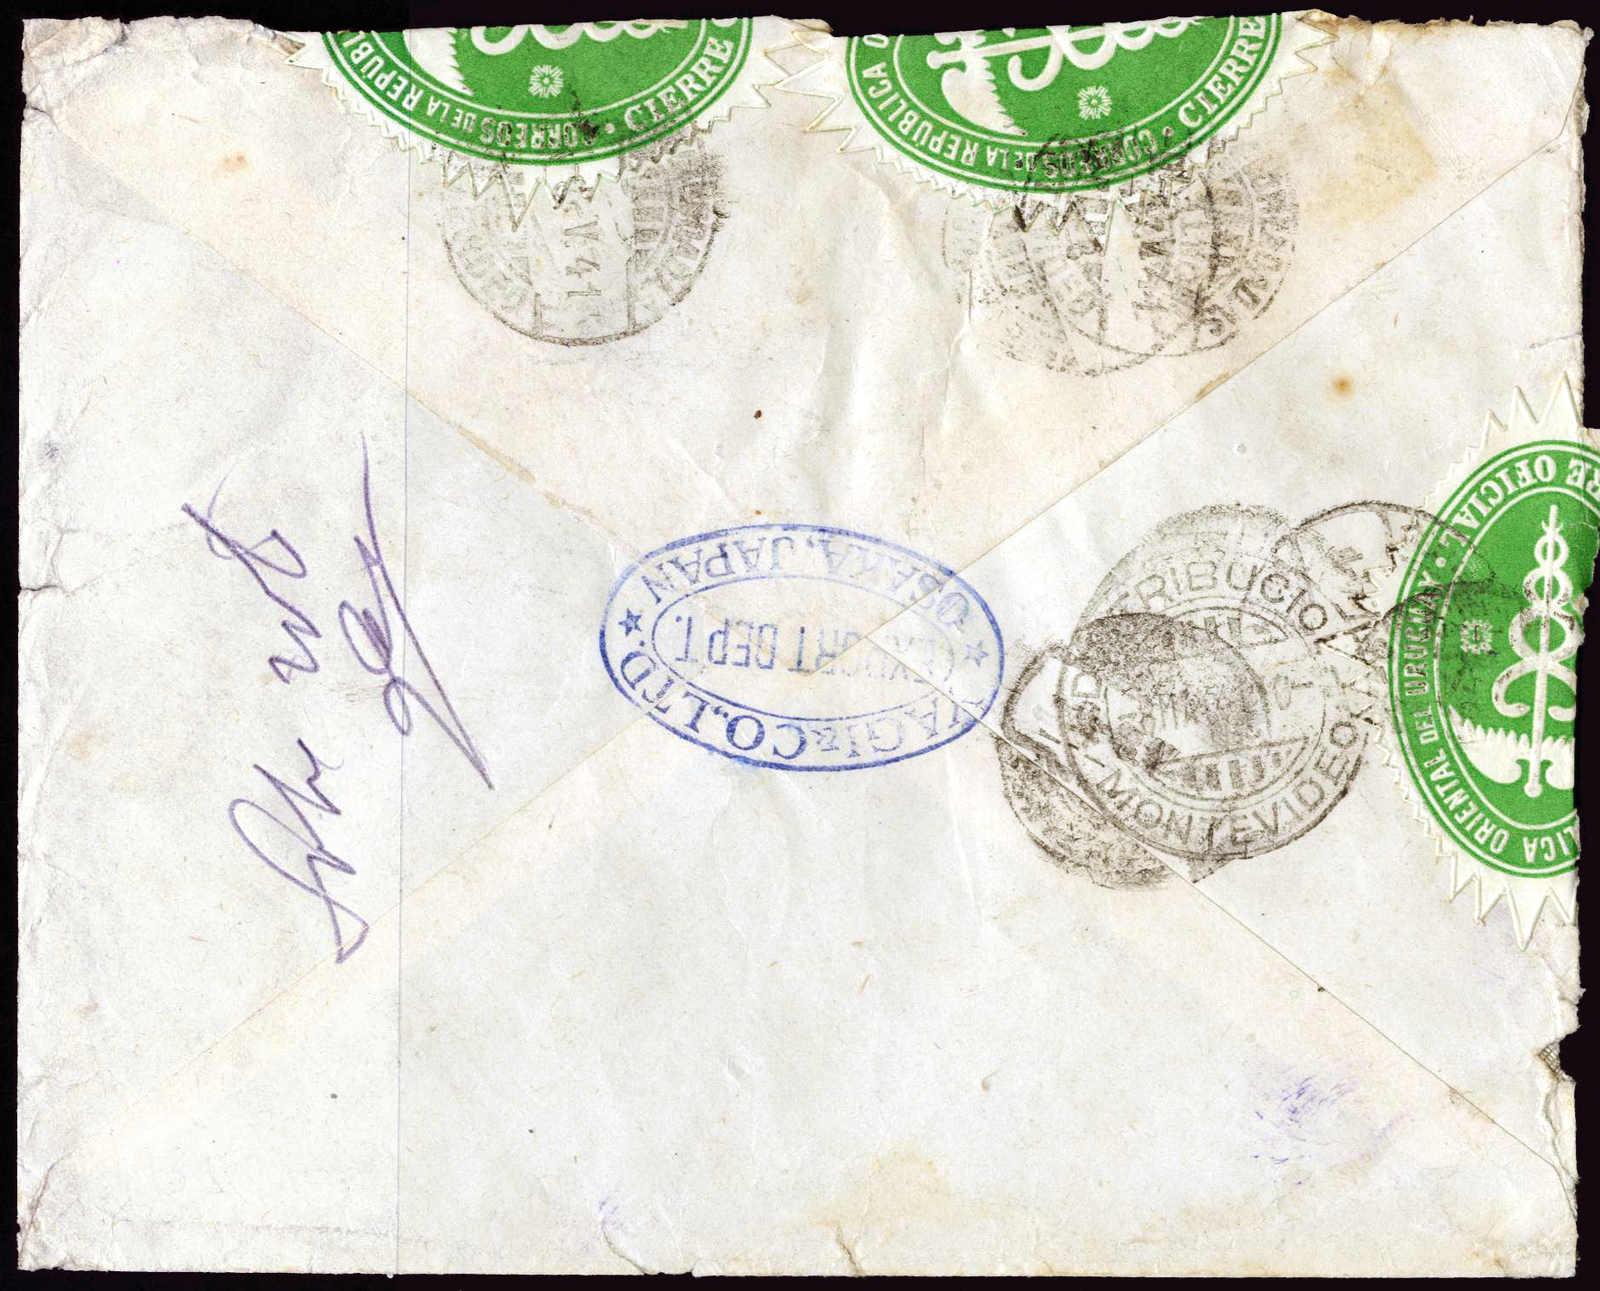 Lot 177 - andere gebiete Japan -  HA HARMERS AUCTIONS S.A. Treasure Hunt 3